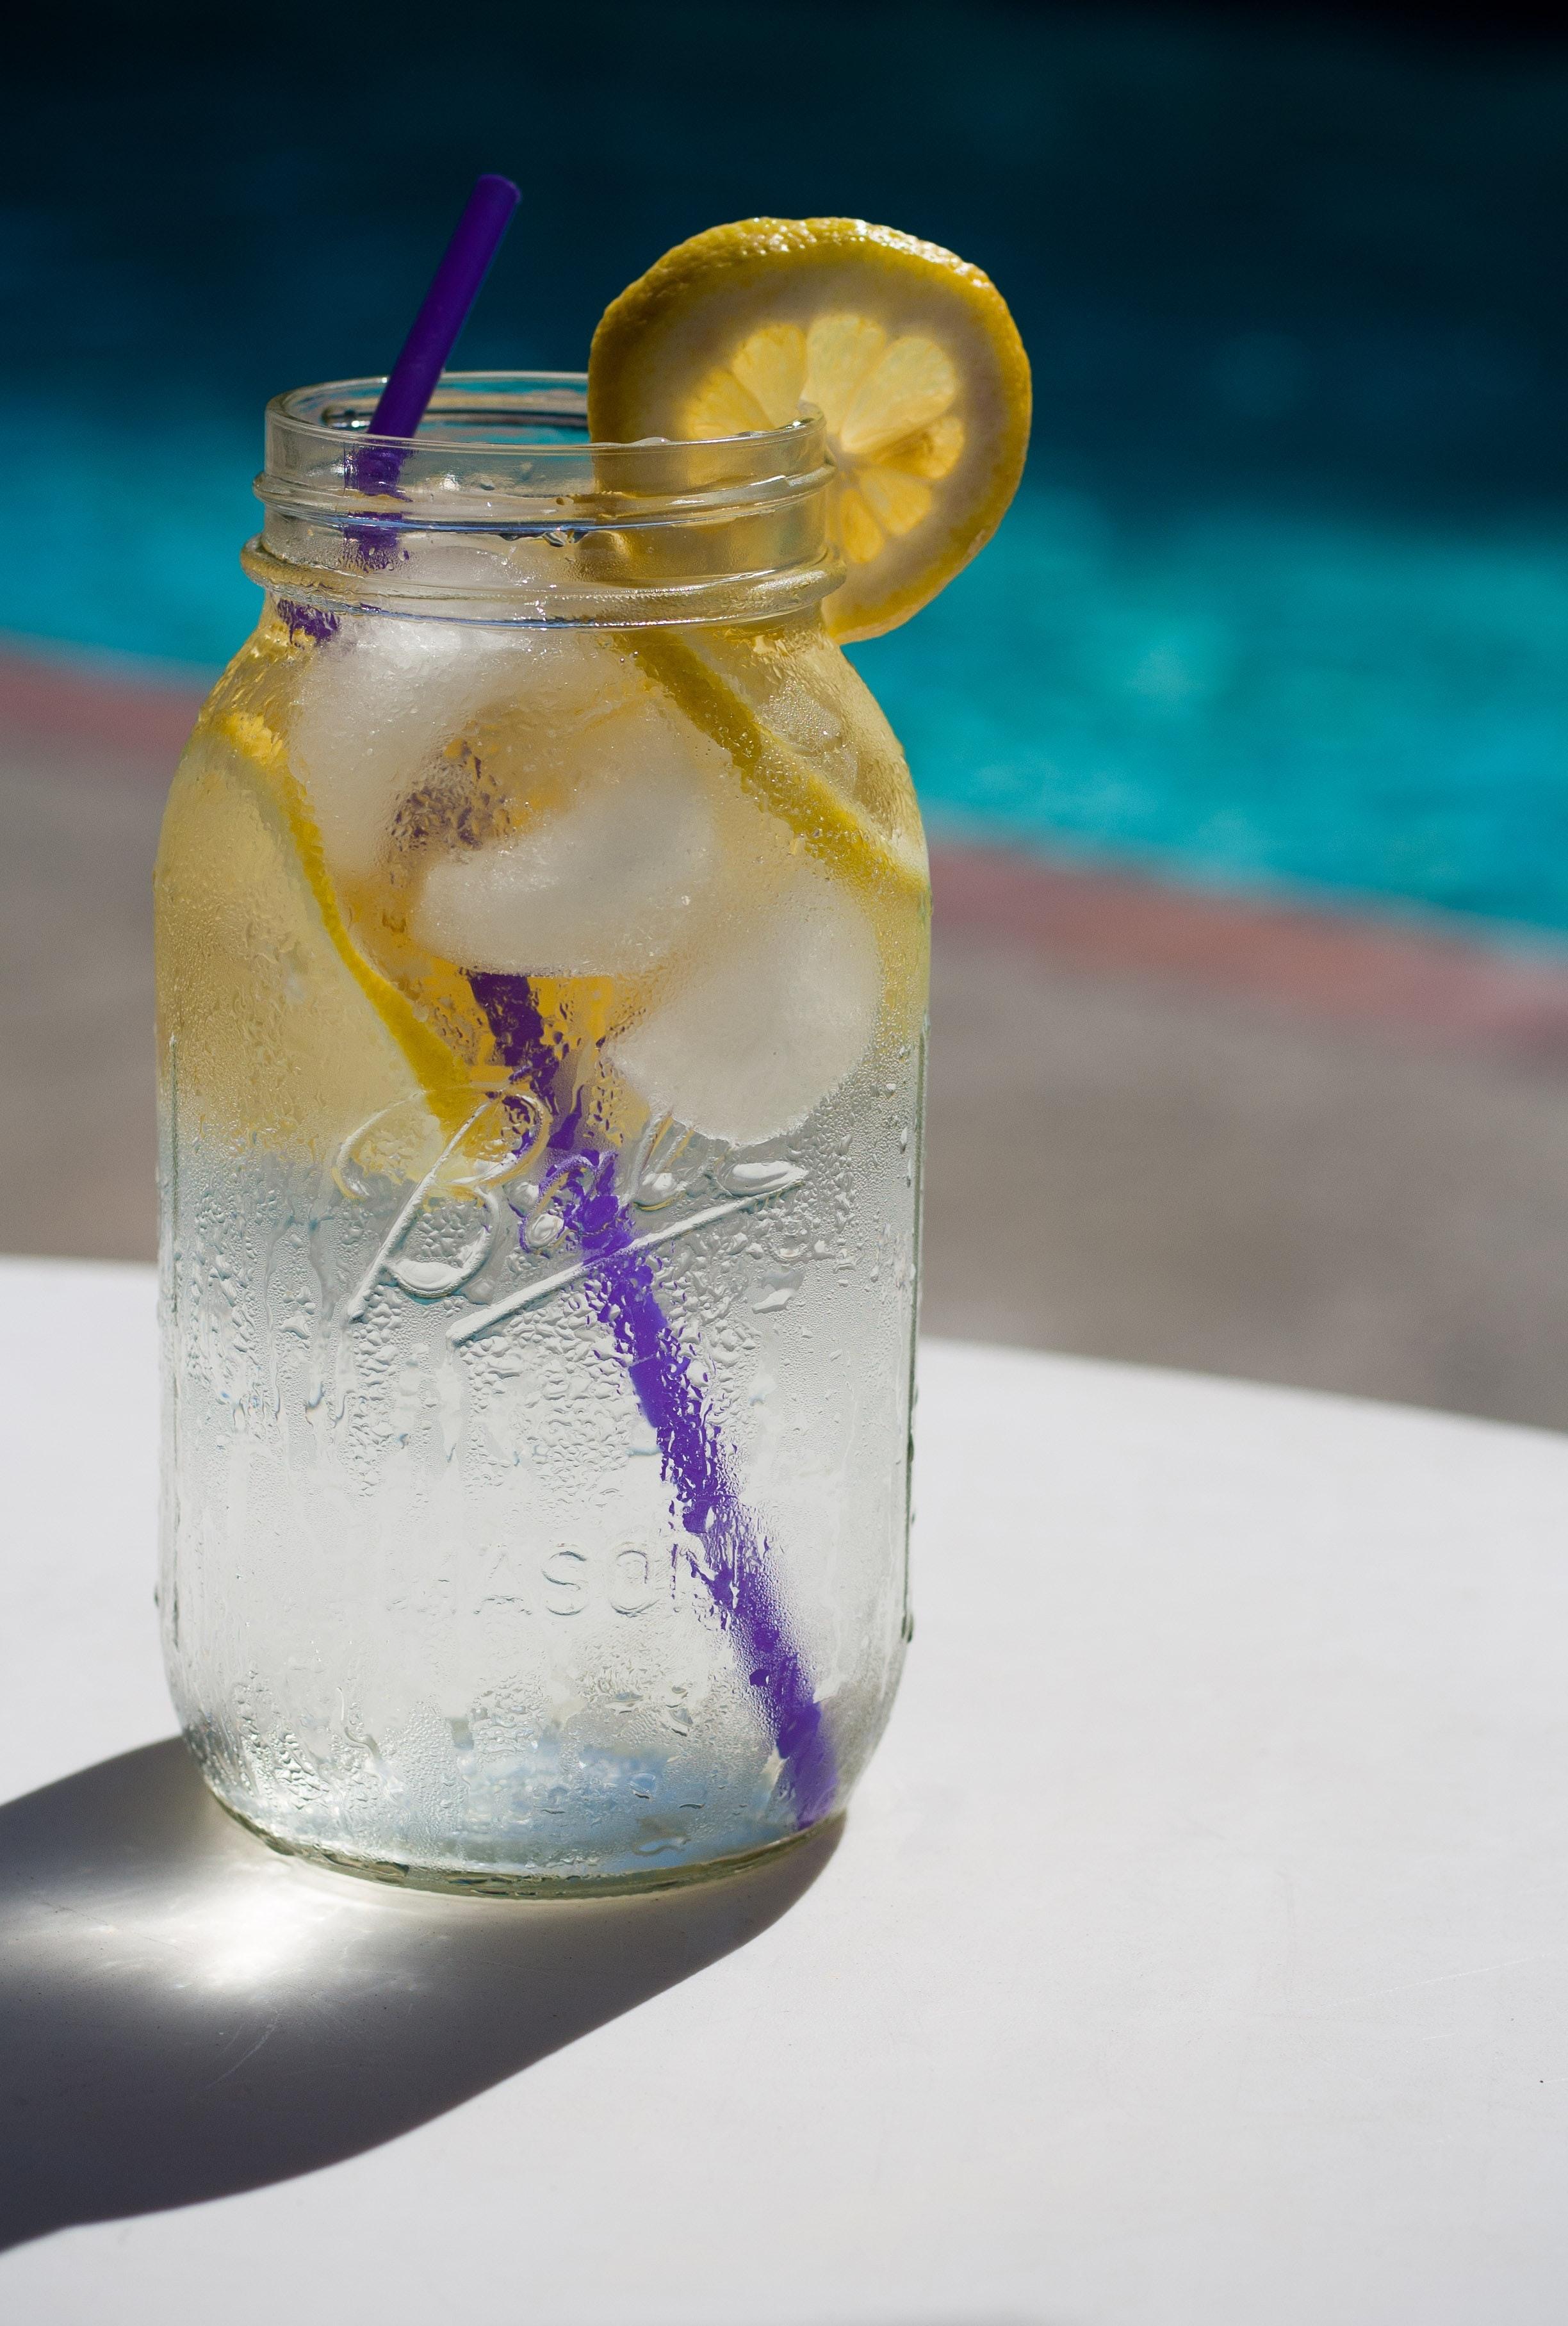 108 beverage-citrus-cold-161466.jpg